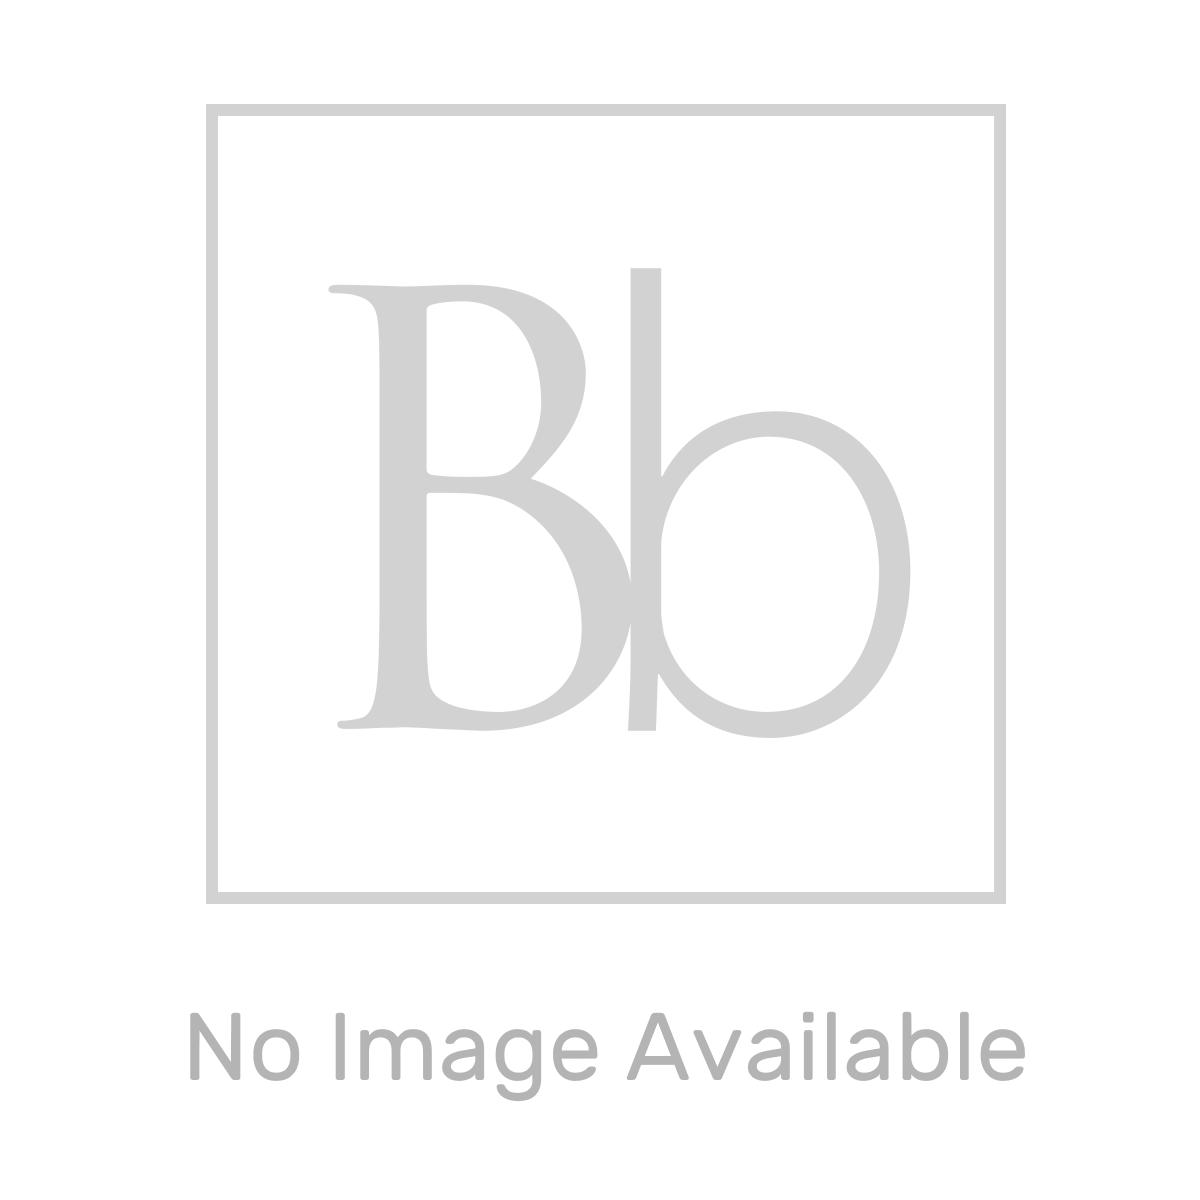 RAK Washington Greige Bathroom Mirror Cabinet 650mm Measurements